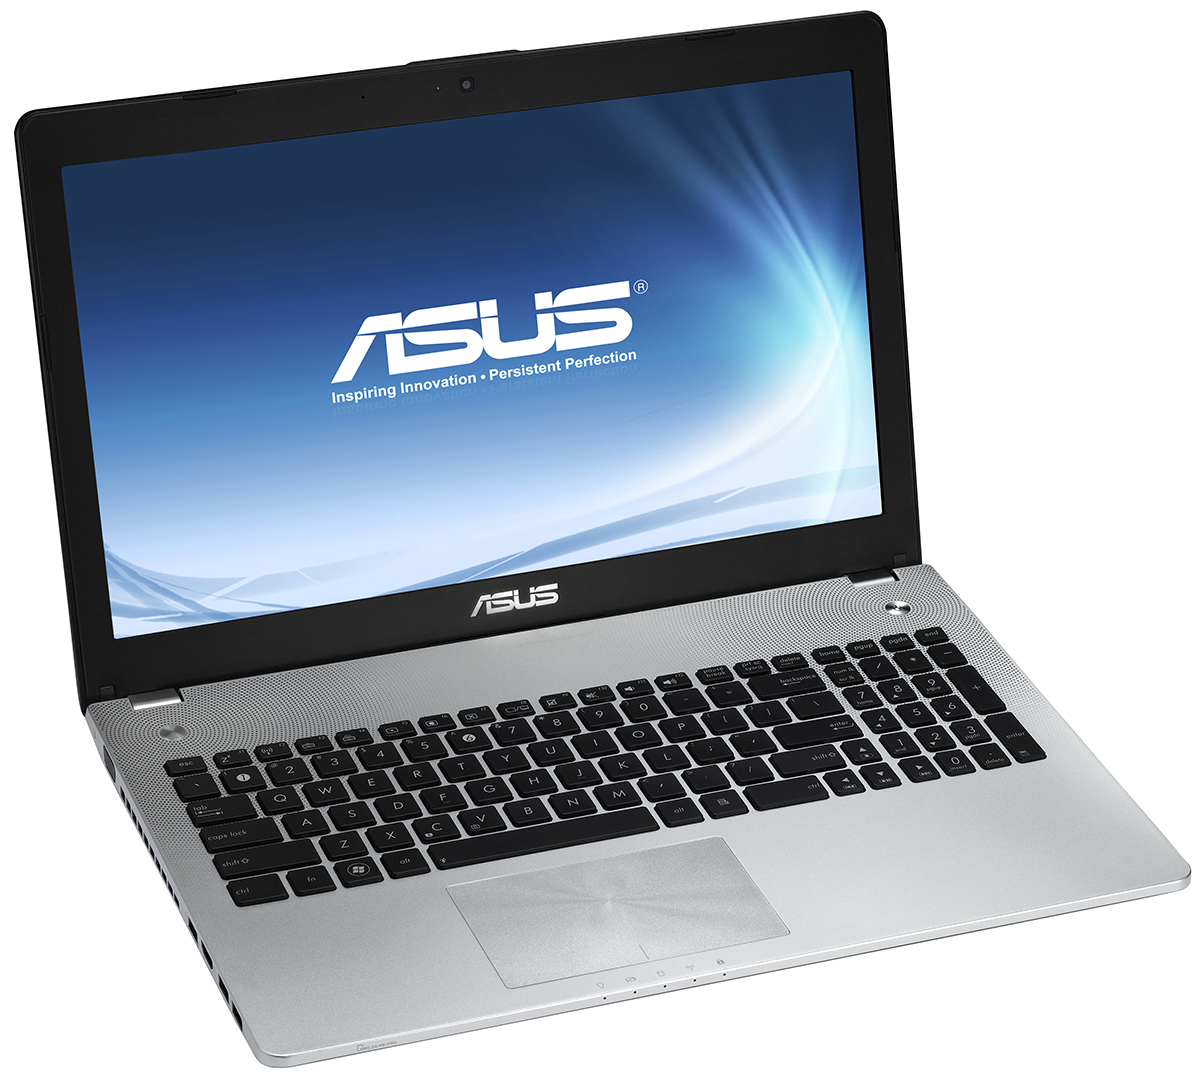 ASUS N56V: laptop specifications 59